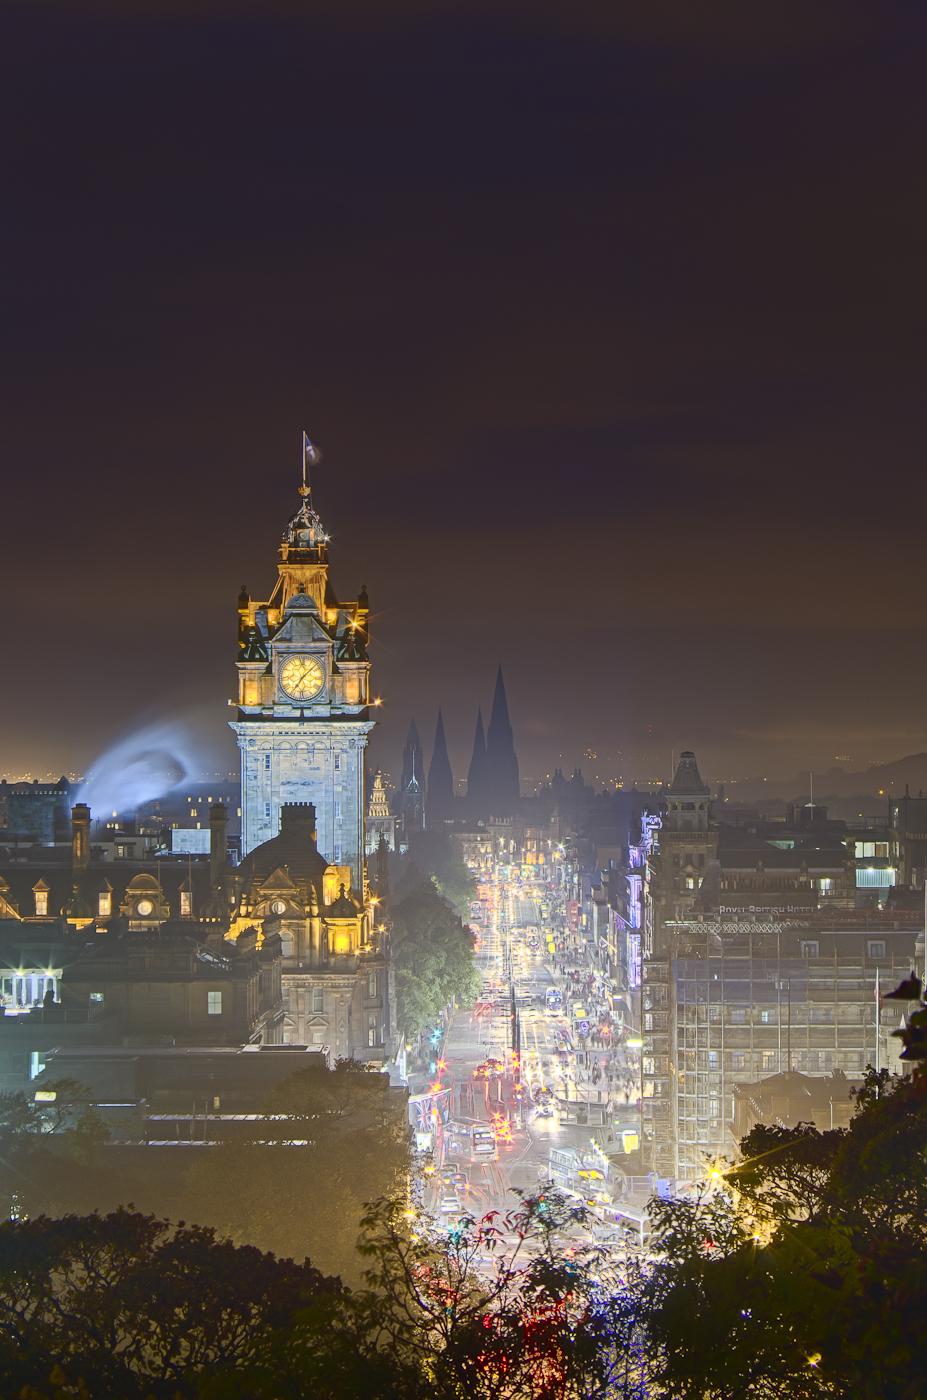 Edinburgh at Night, United Kingdom